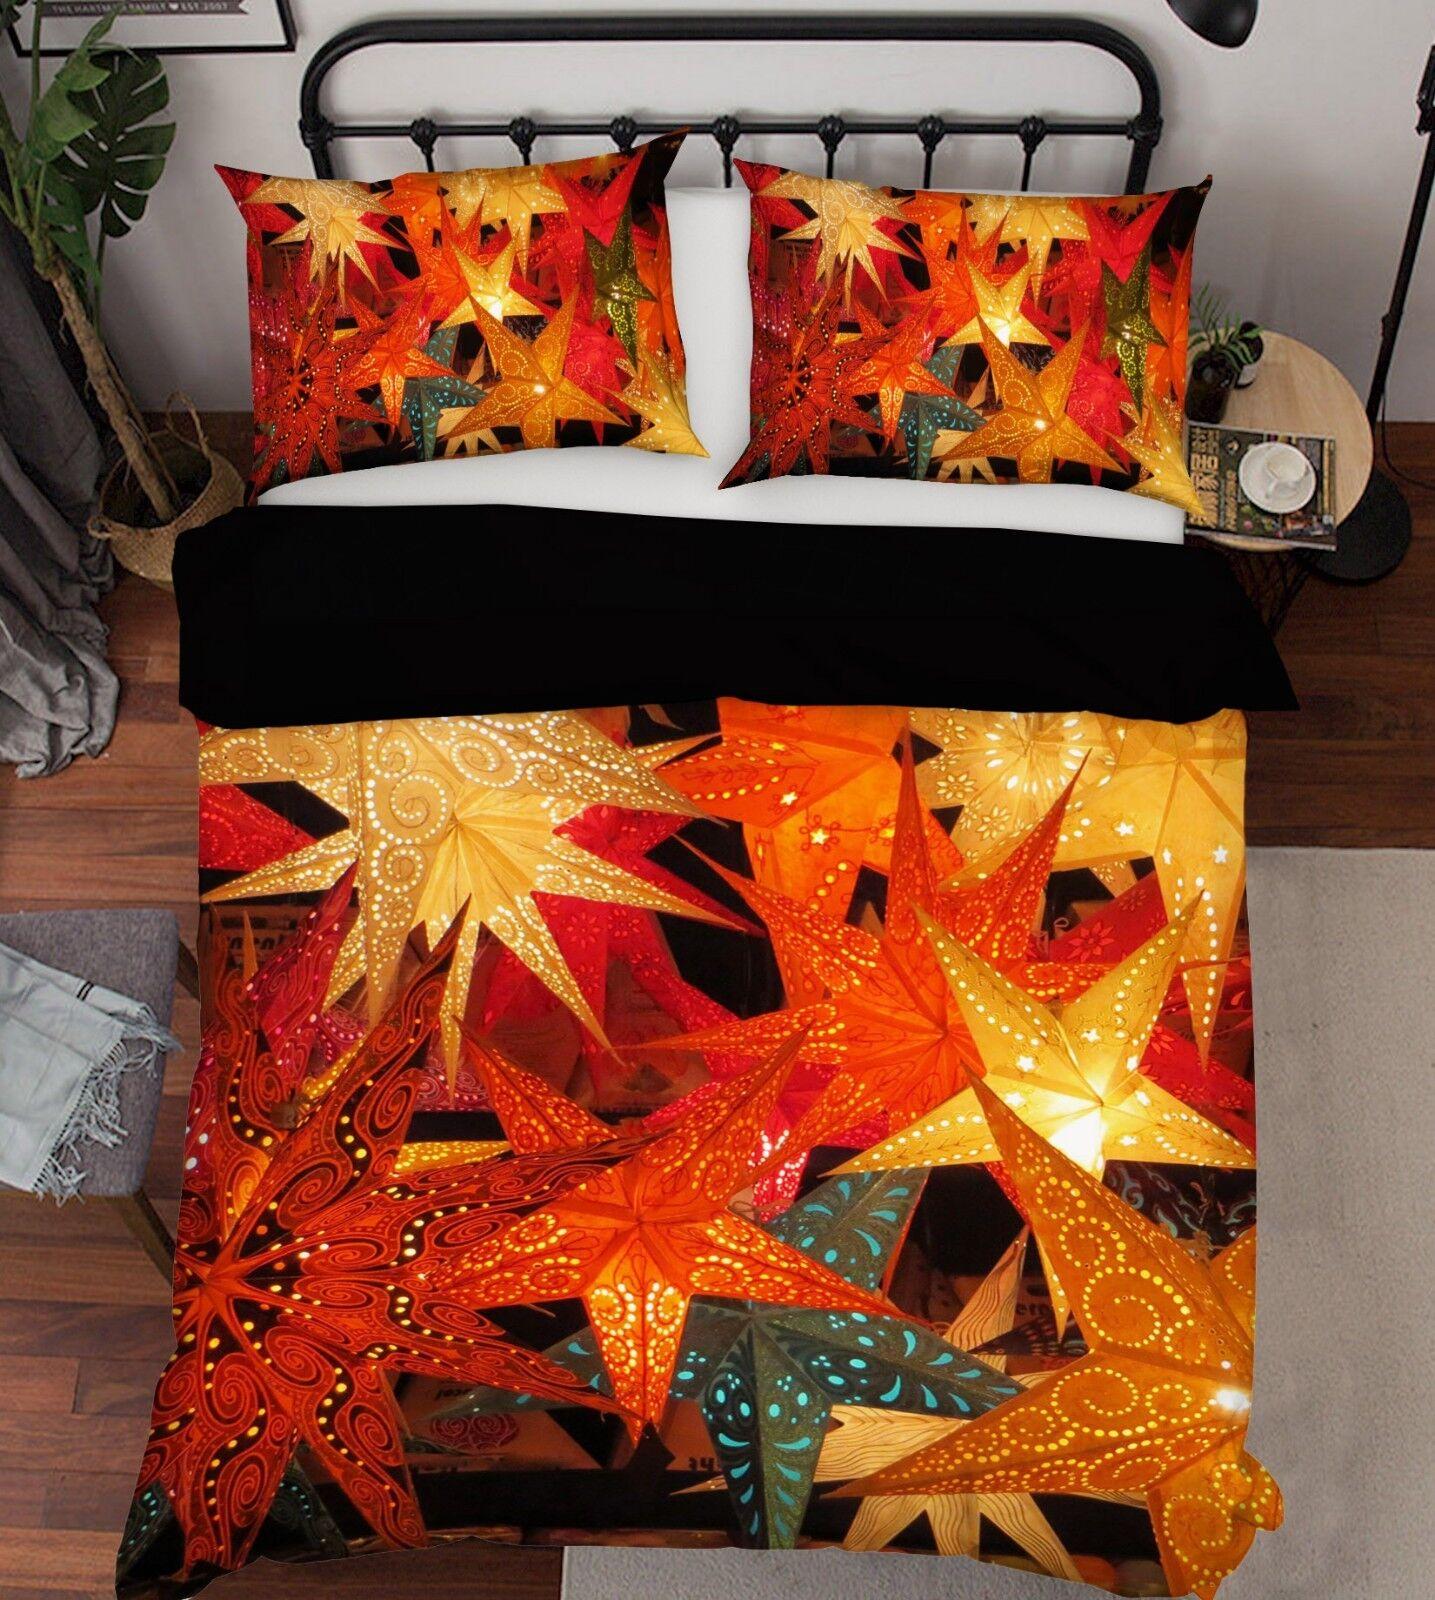 3D Christmas Xmas Maple 7 Bed Pillowcases Quilt Duvet Cover Set Single Queen UK